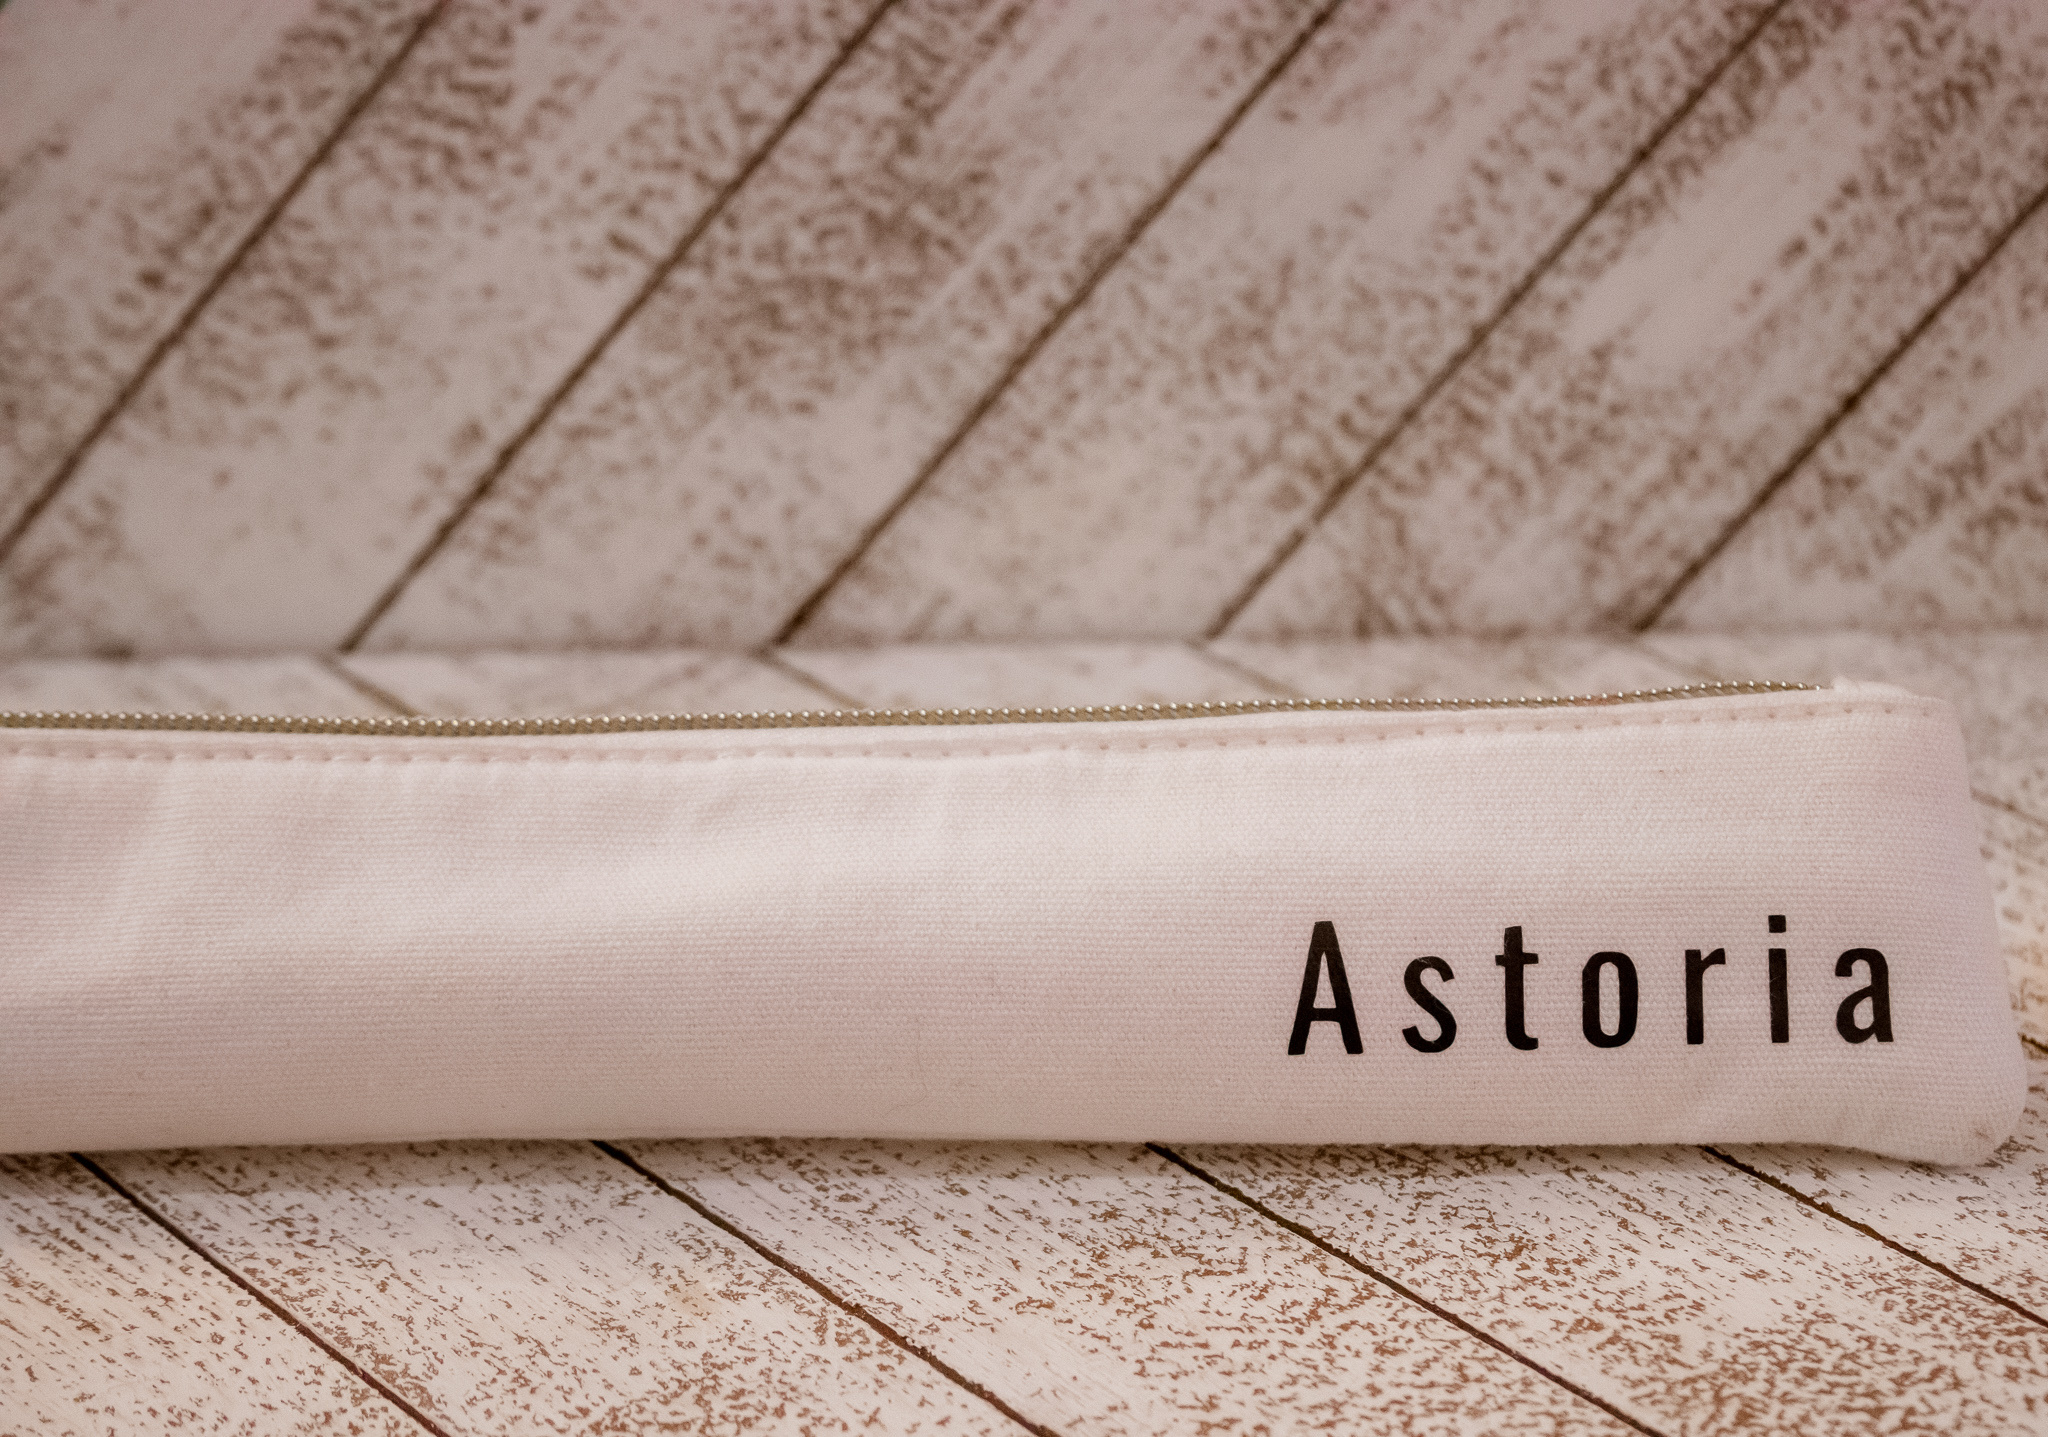 Last Straw Astoria - Straw Set Waterproof Lined Bag - Rose Gold - 6 Pc